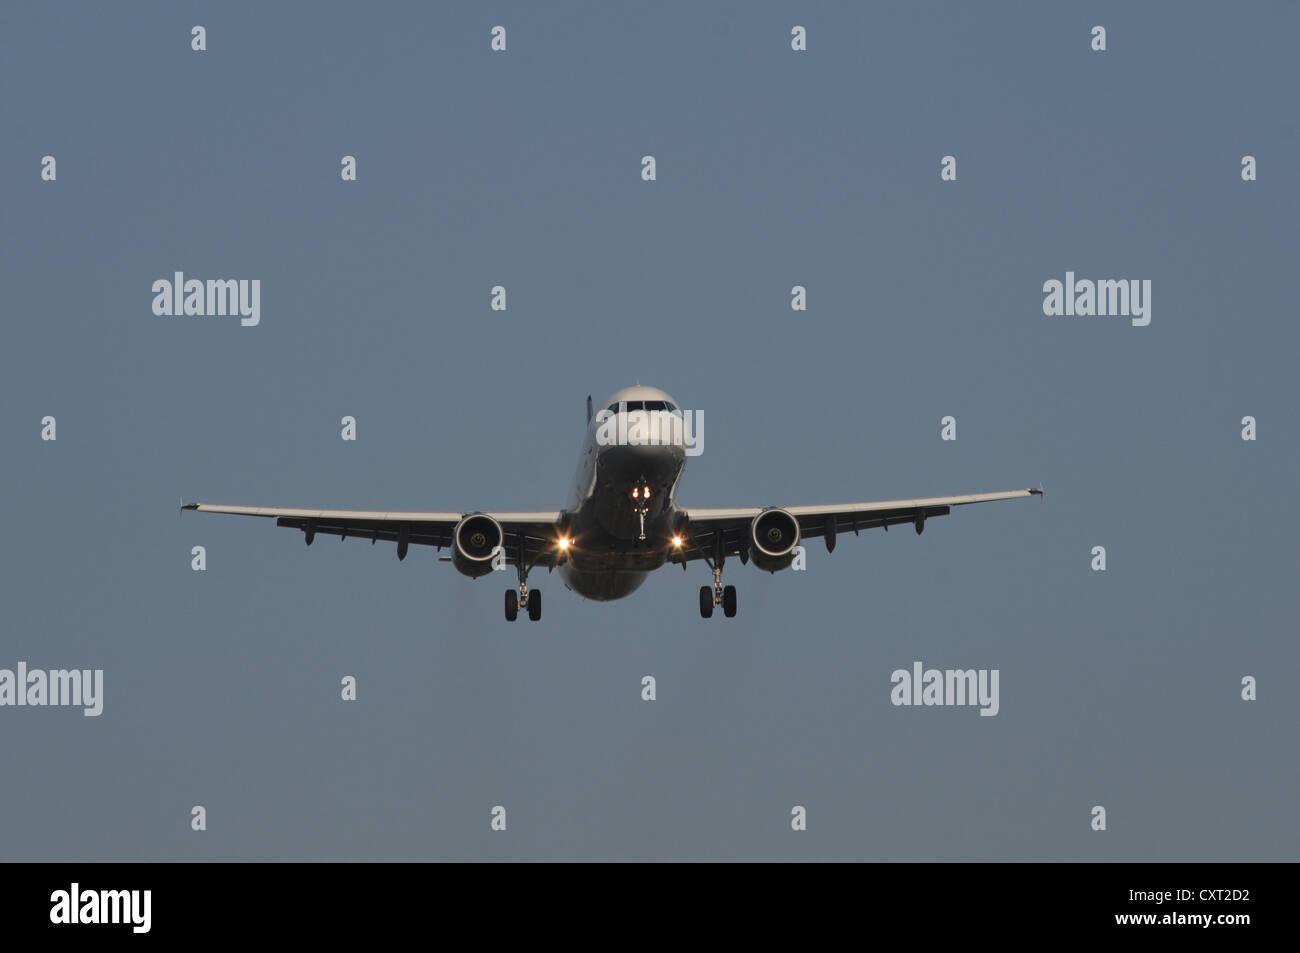 Passenger aircraft during landing approach, from below - Stock Image